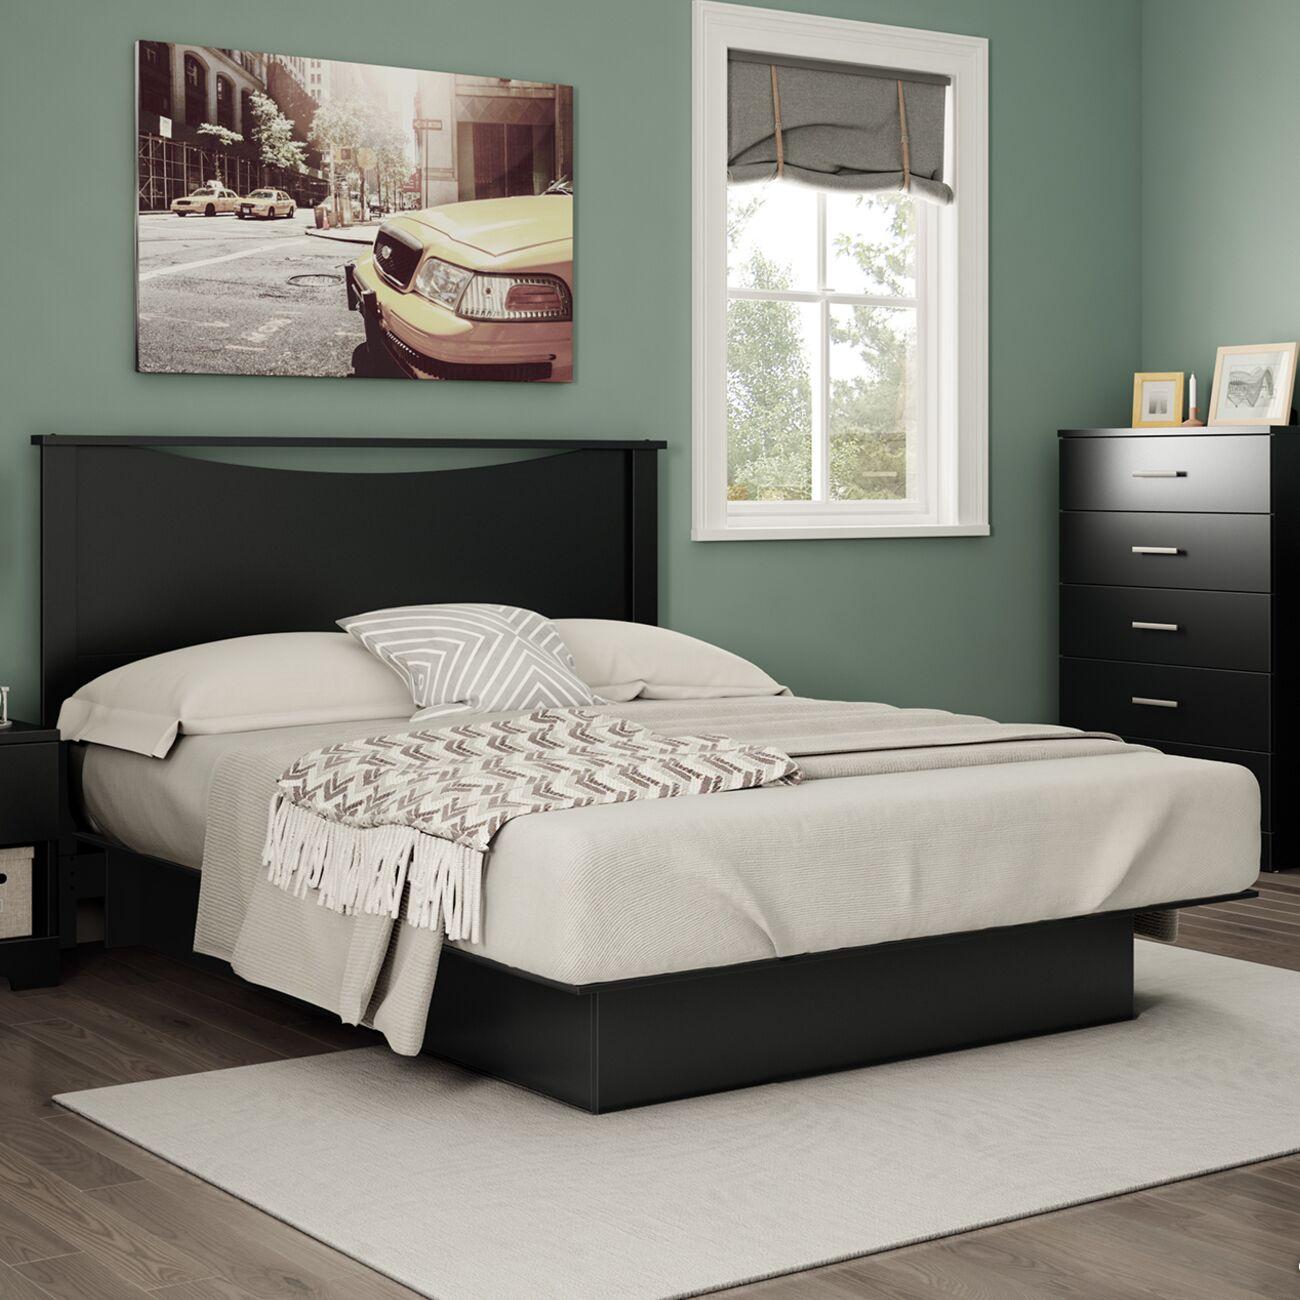 Gramercy Queen Storage Platform Bed Color: Black